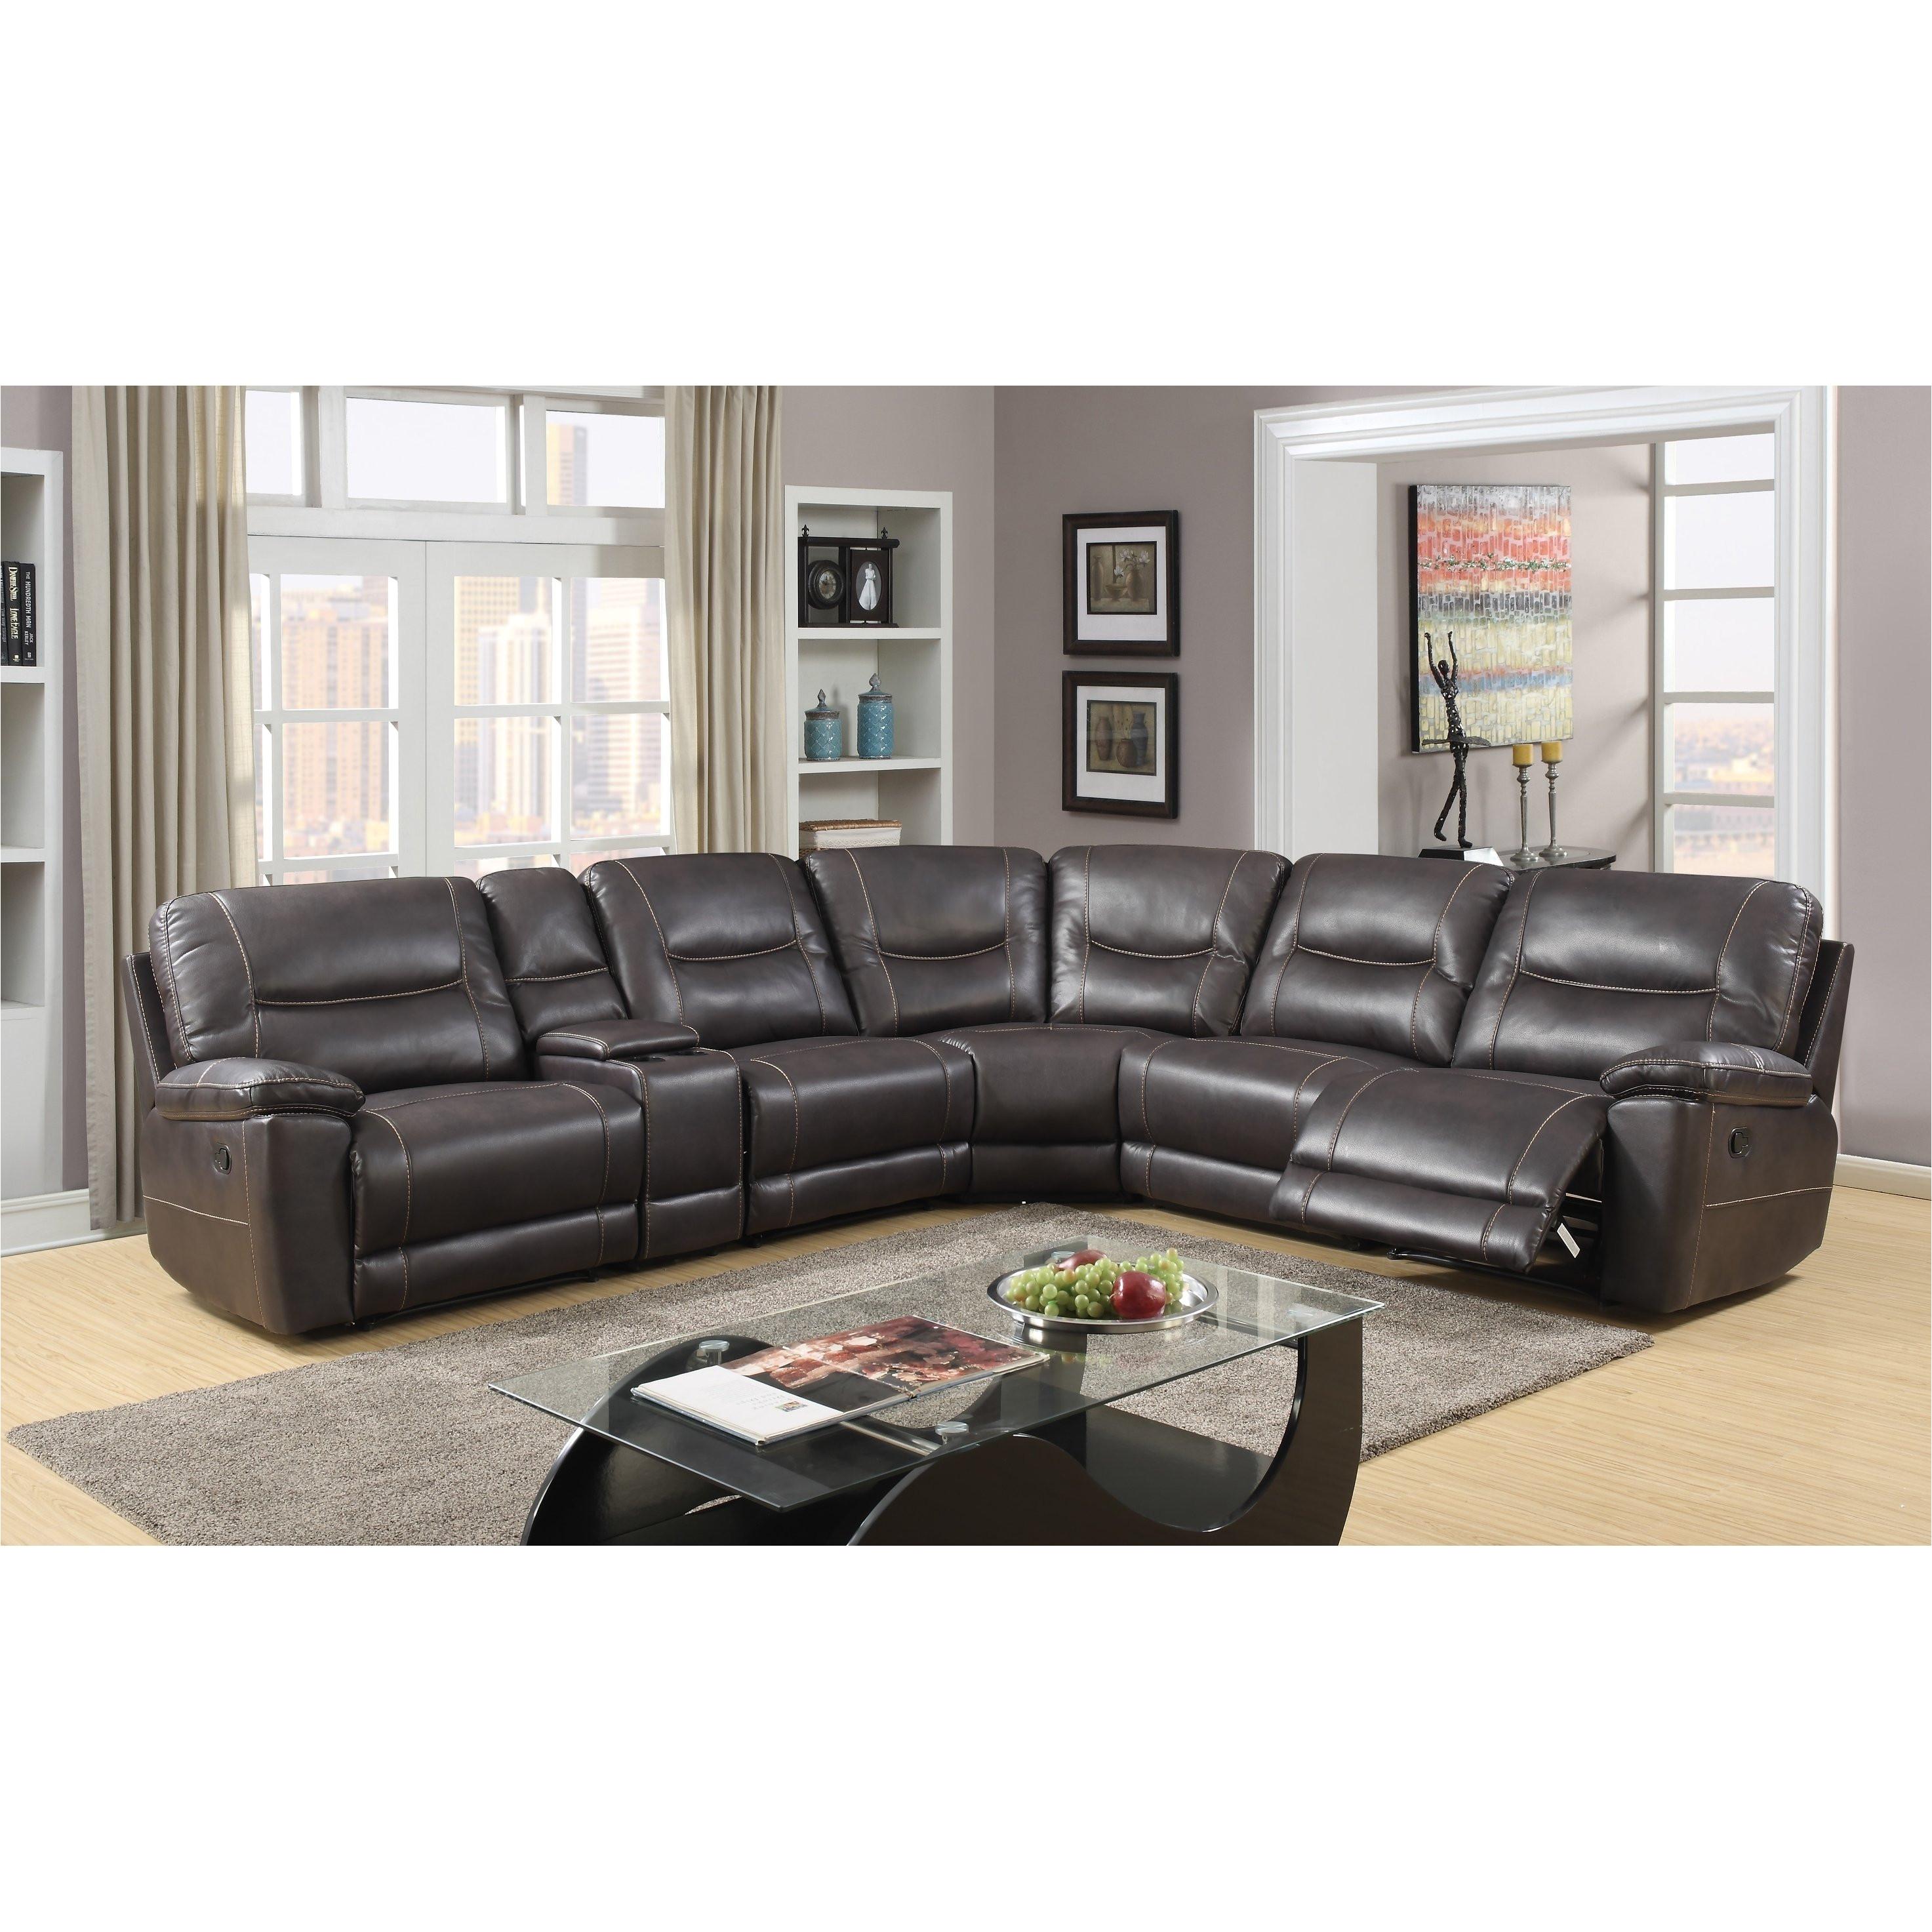 American Freight Discount Furniture Near Me Inspirational American Freight  Sectional Sofas Hd Shape Idea